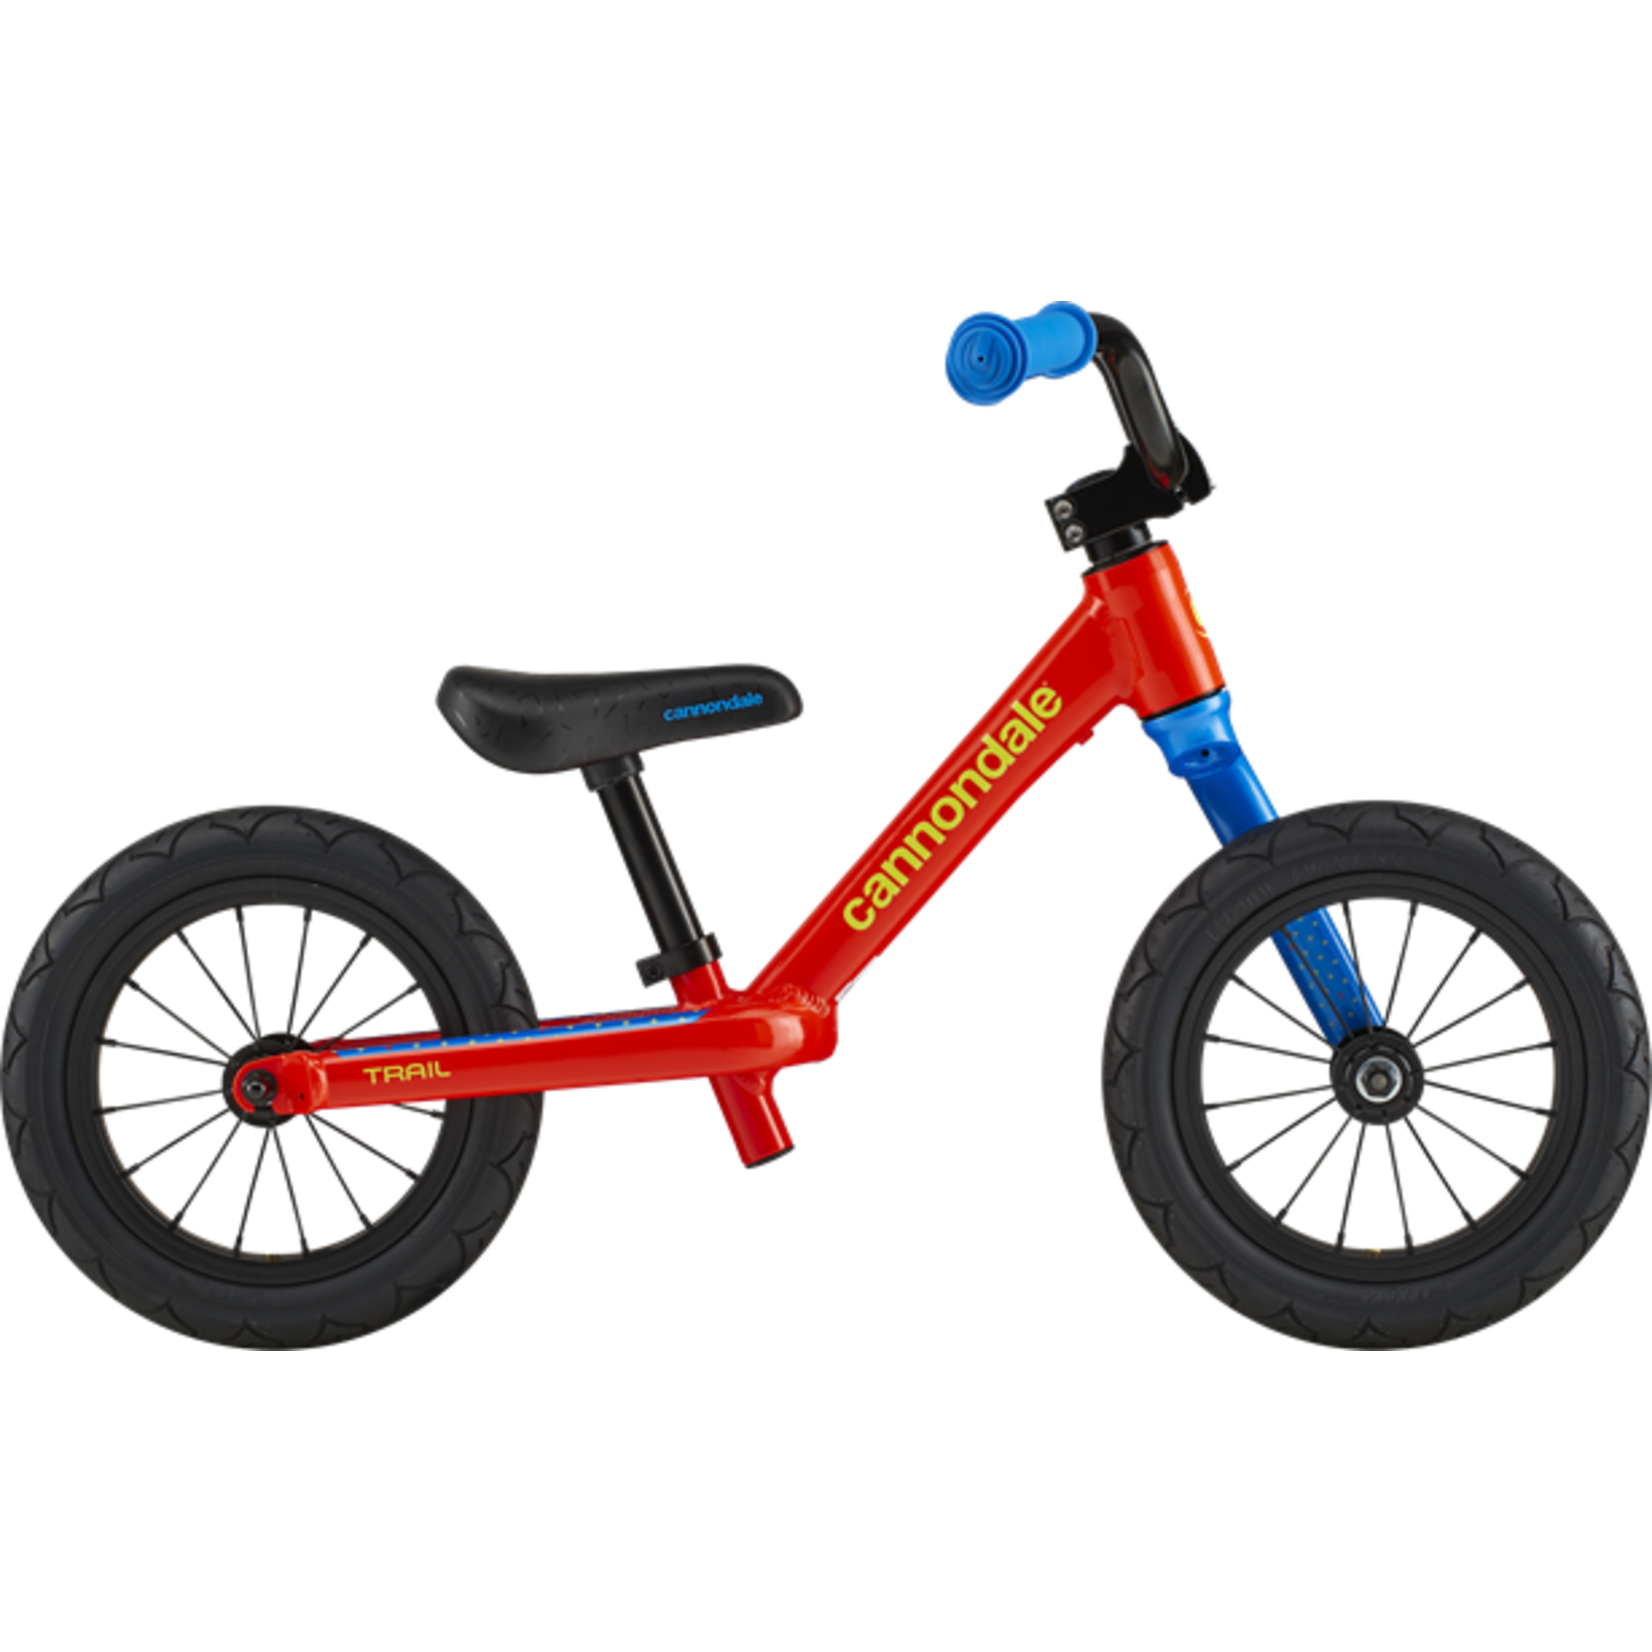 Cannondale Cannondale Push Bike